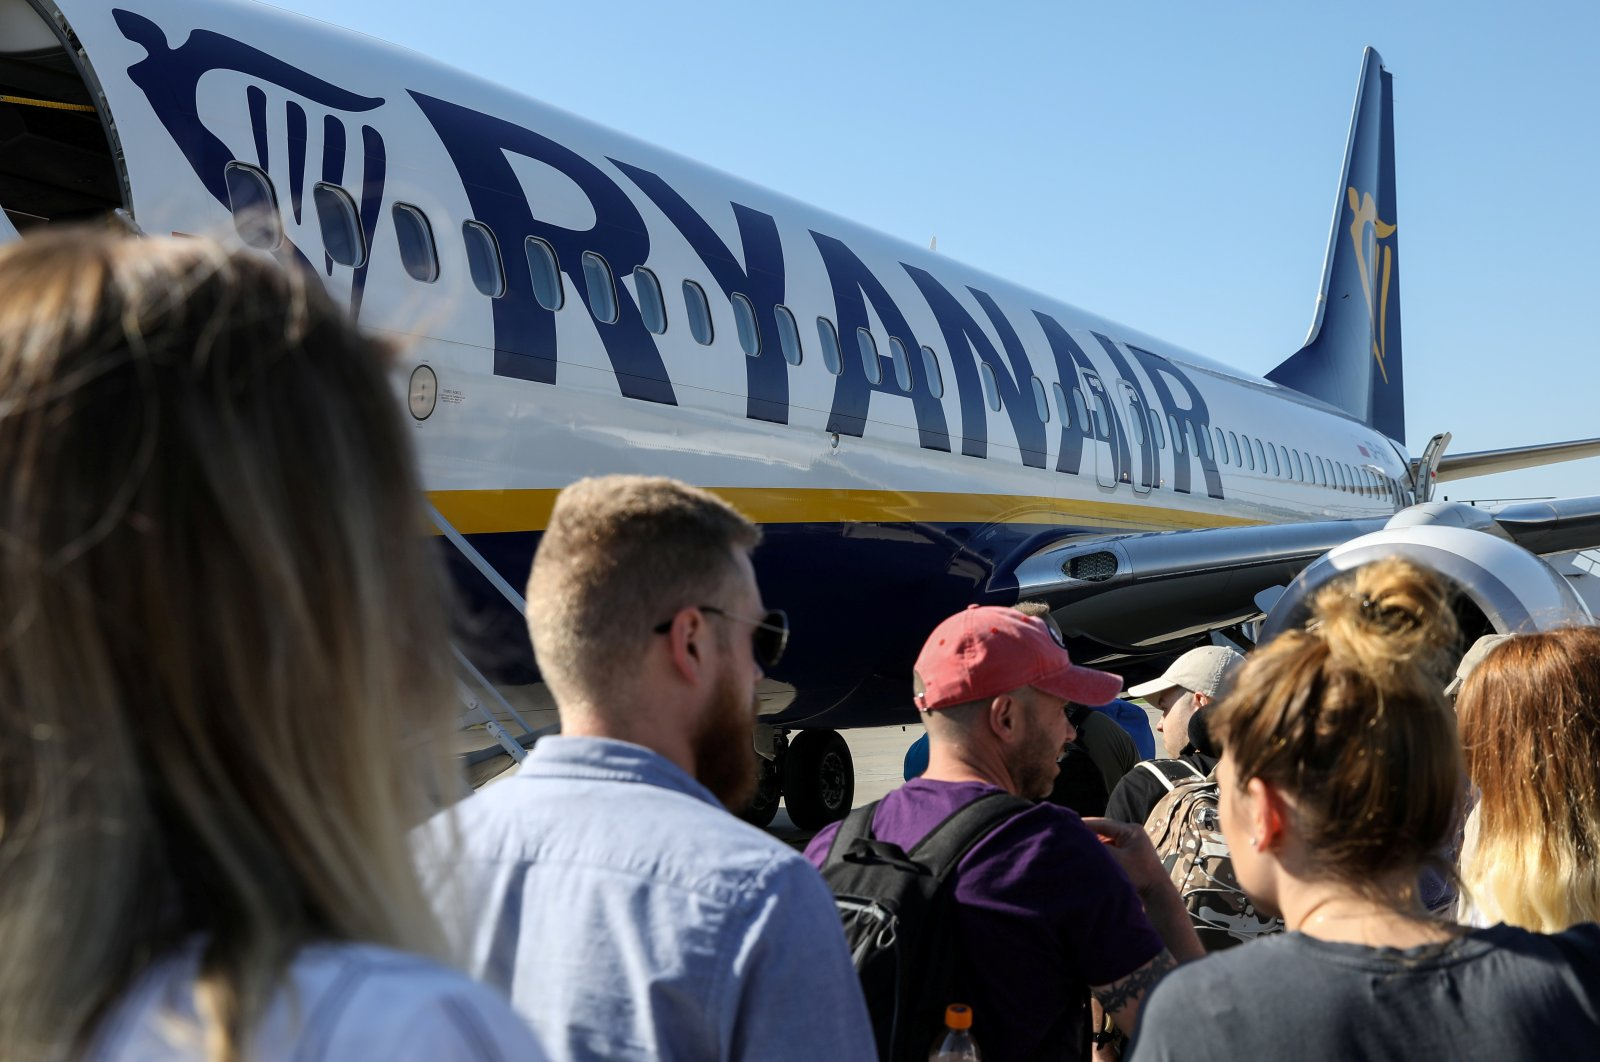 Passengers board a Ryanair flight in Gdansk, Poland, June 19, 2019. (Reuters Photo)